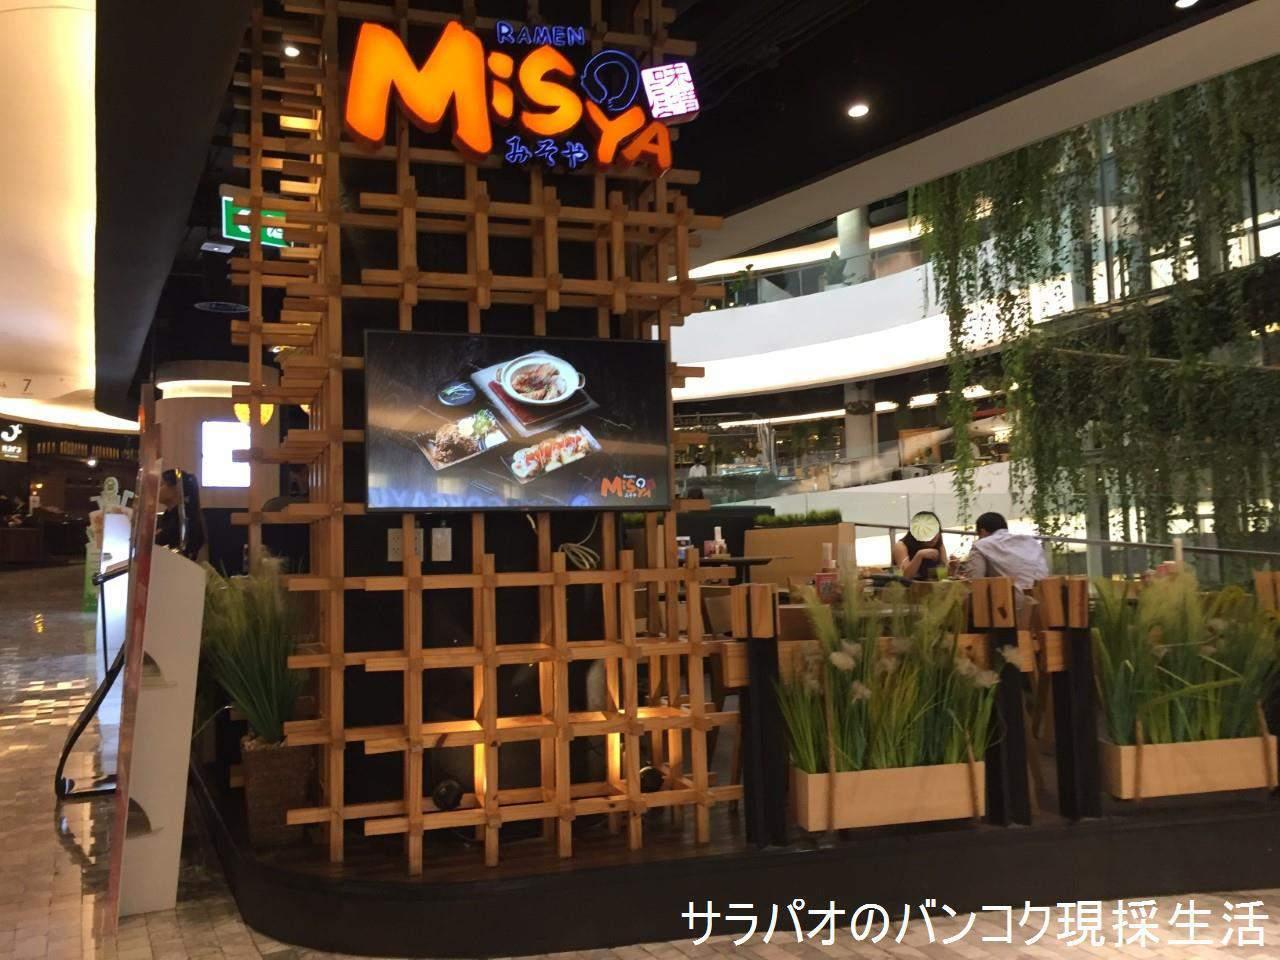 Misoya_01.jpg